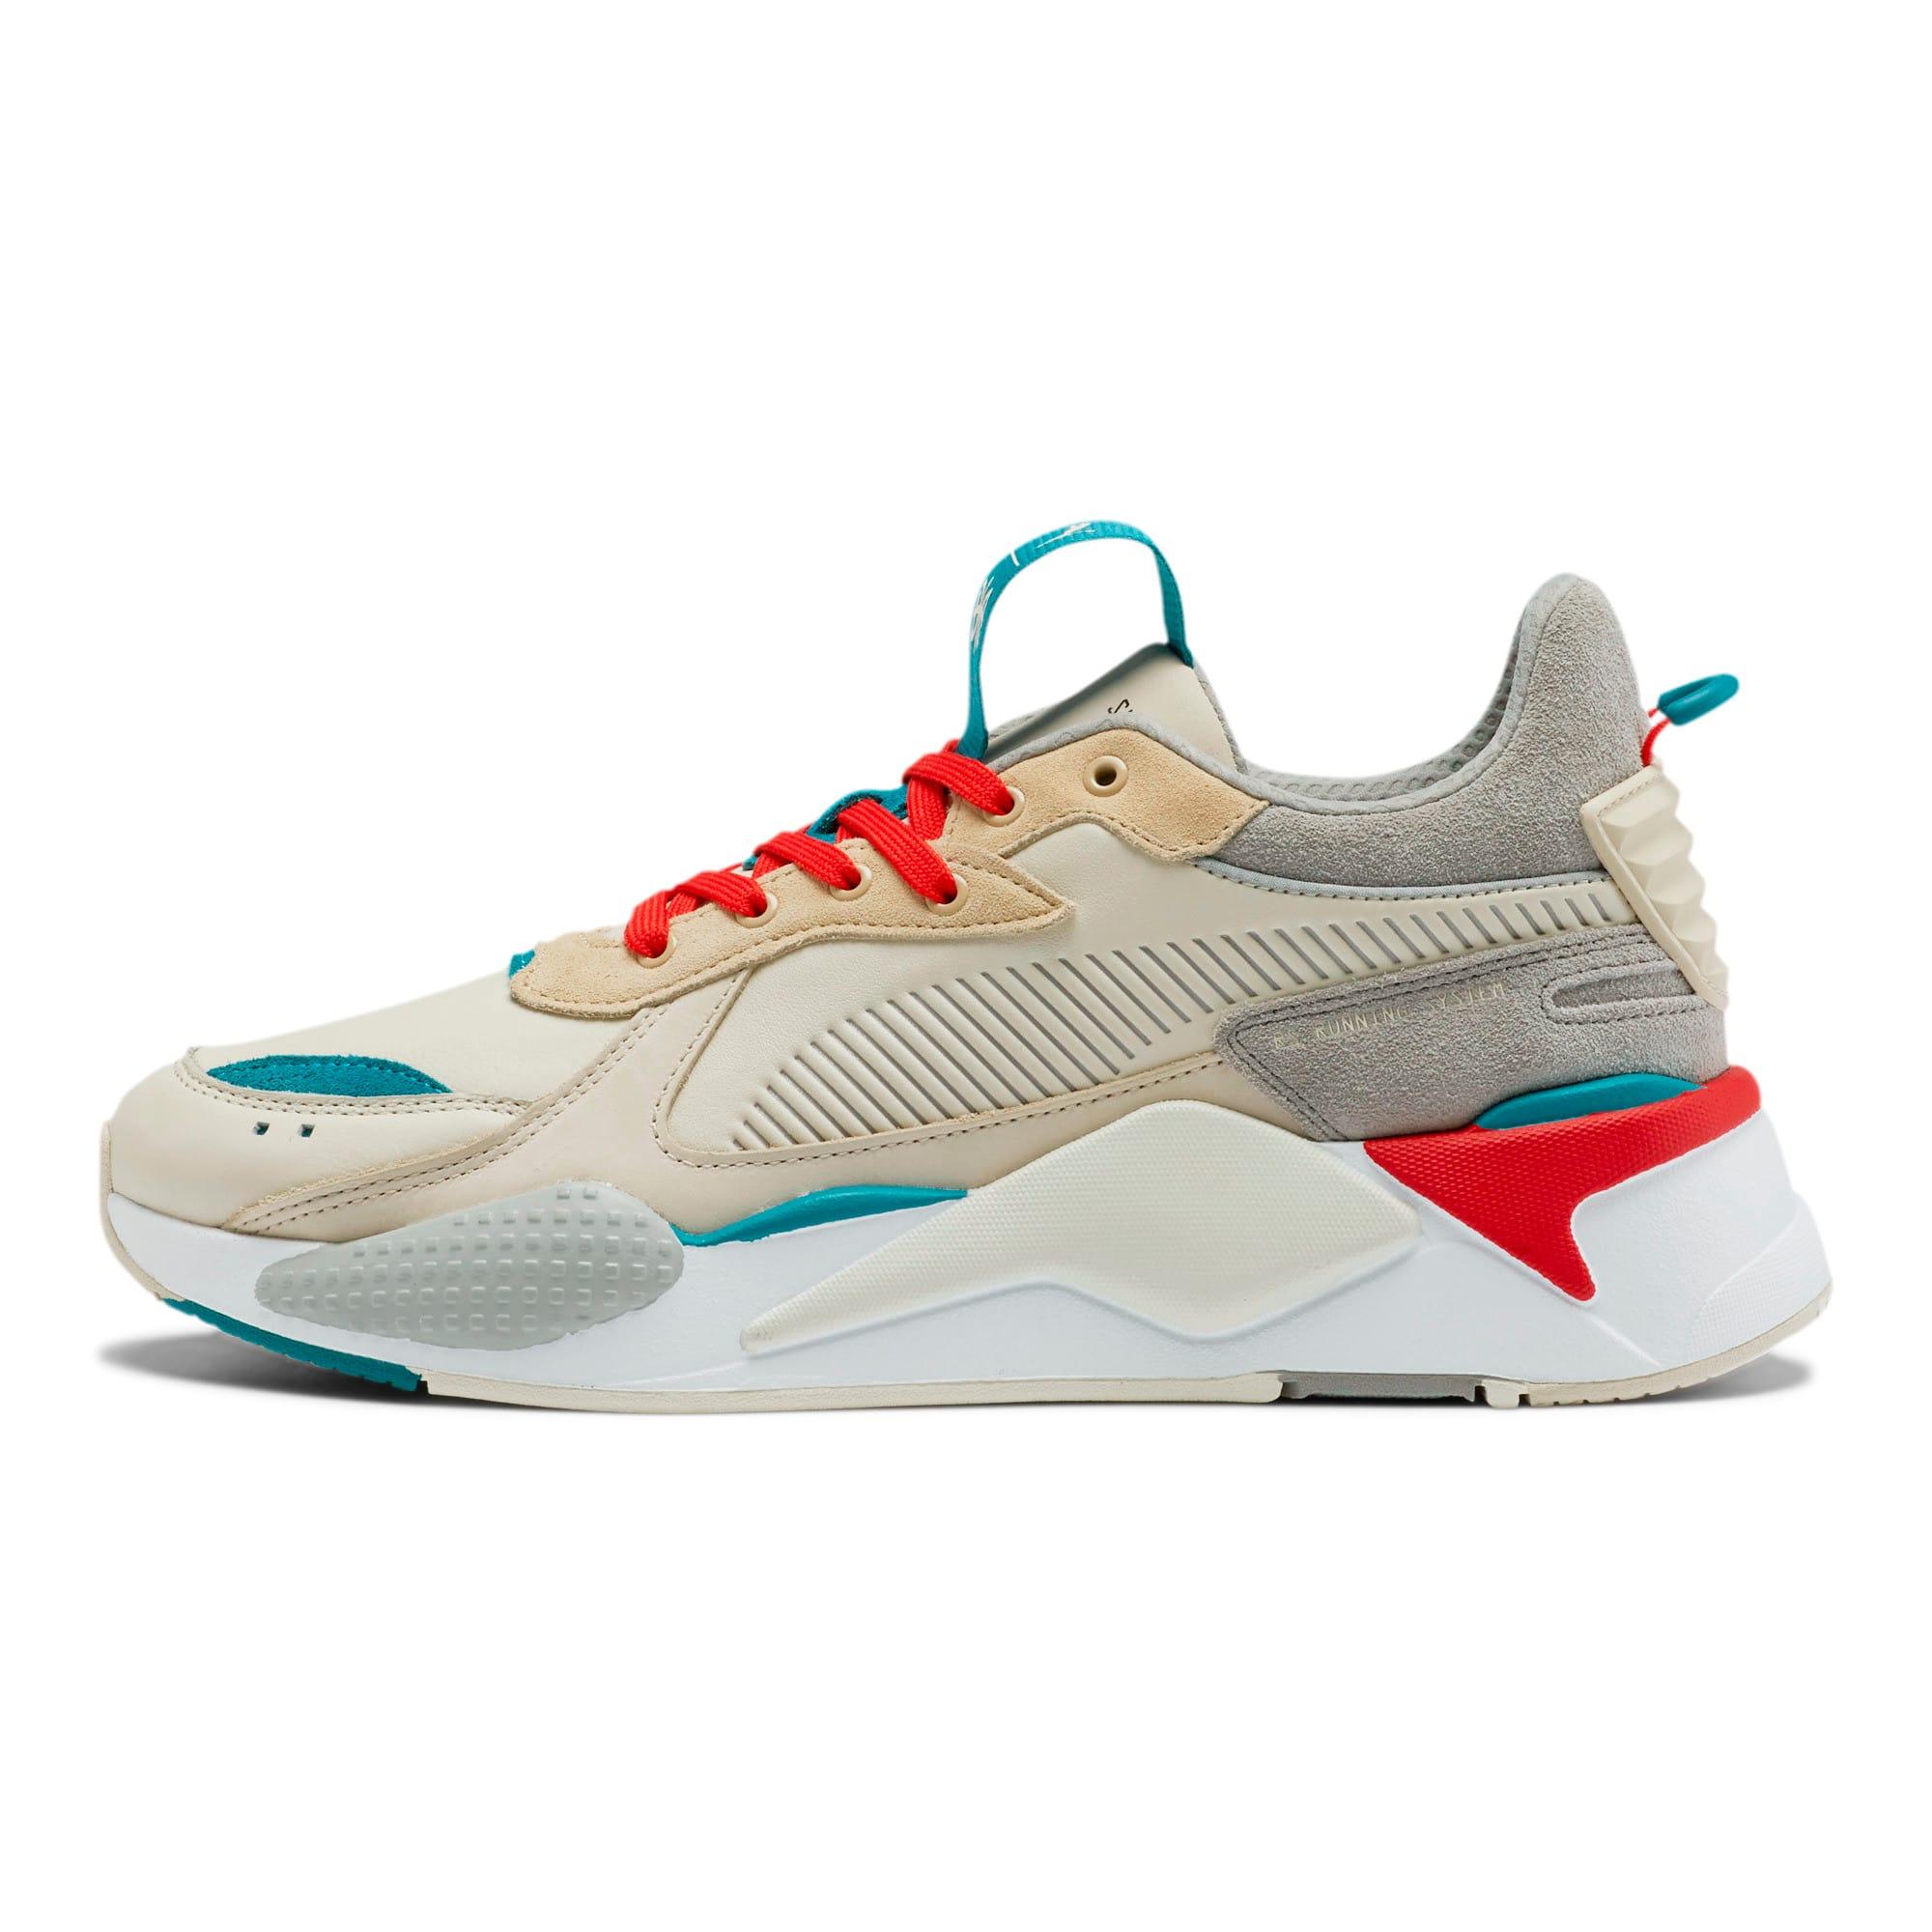 save off 1e35e a04b7 RS-X DEANDRE Sneakers